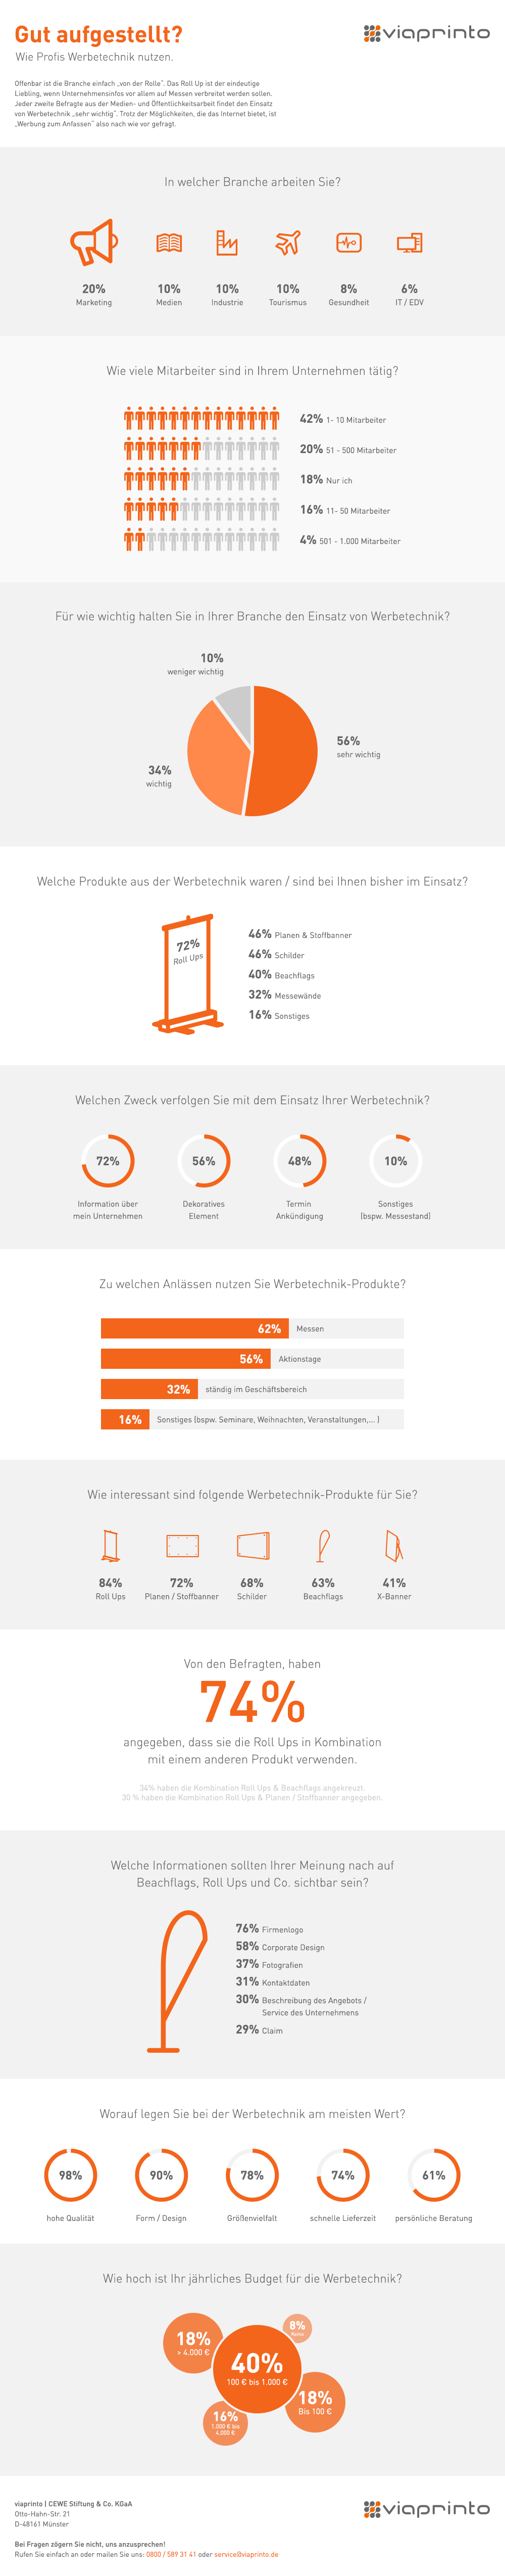 viaprinto-Infografik_© viaprinto